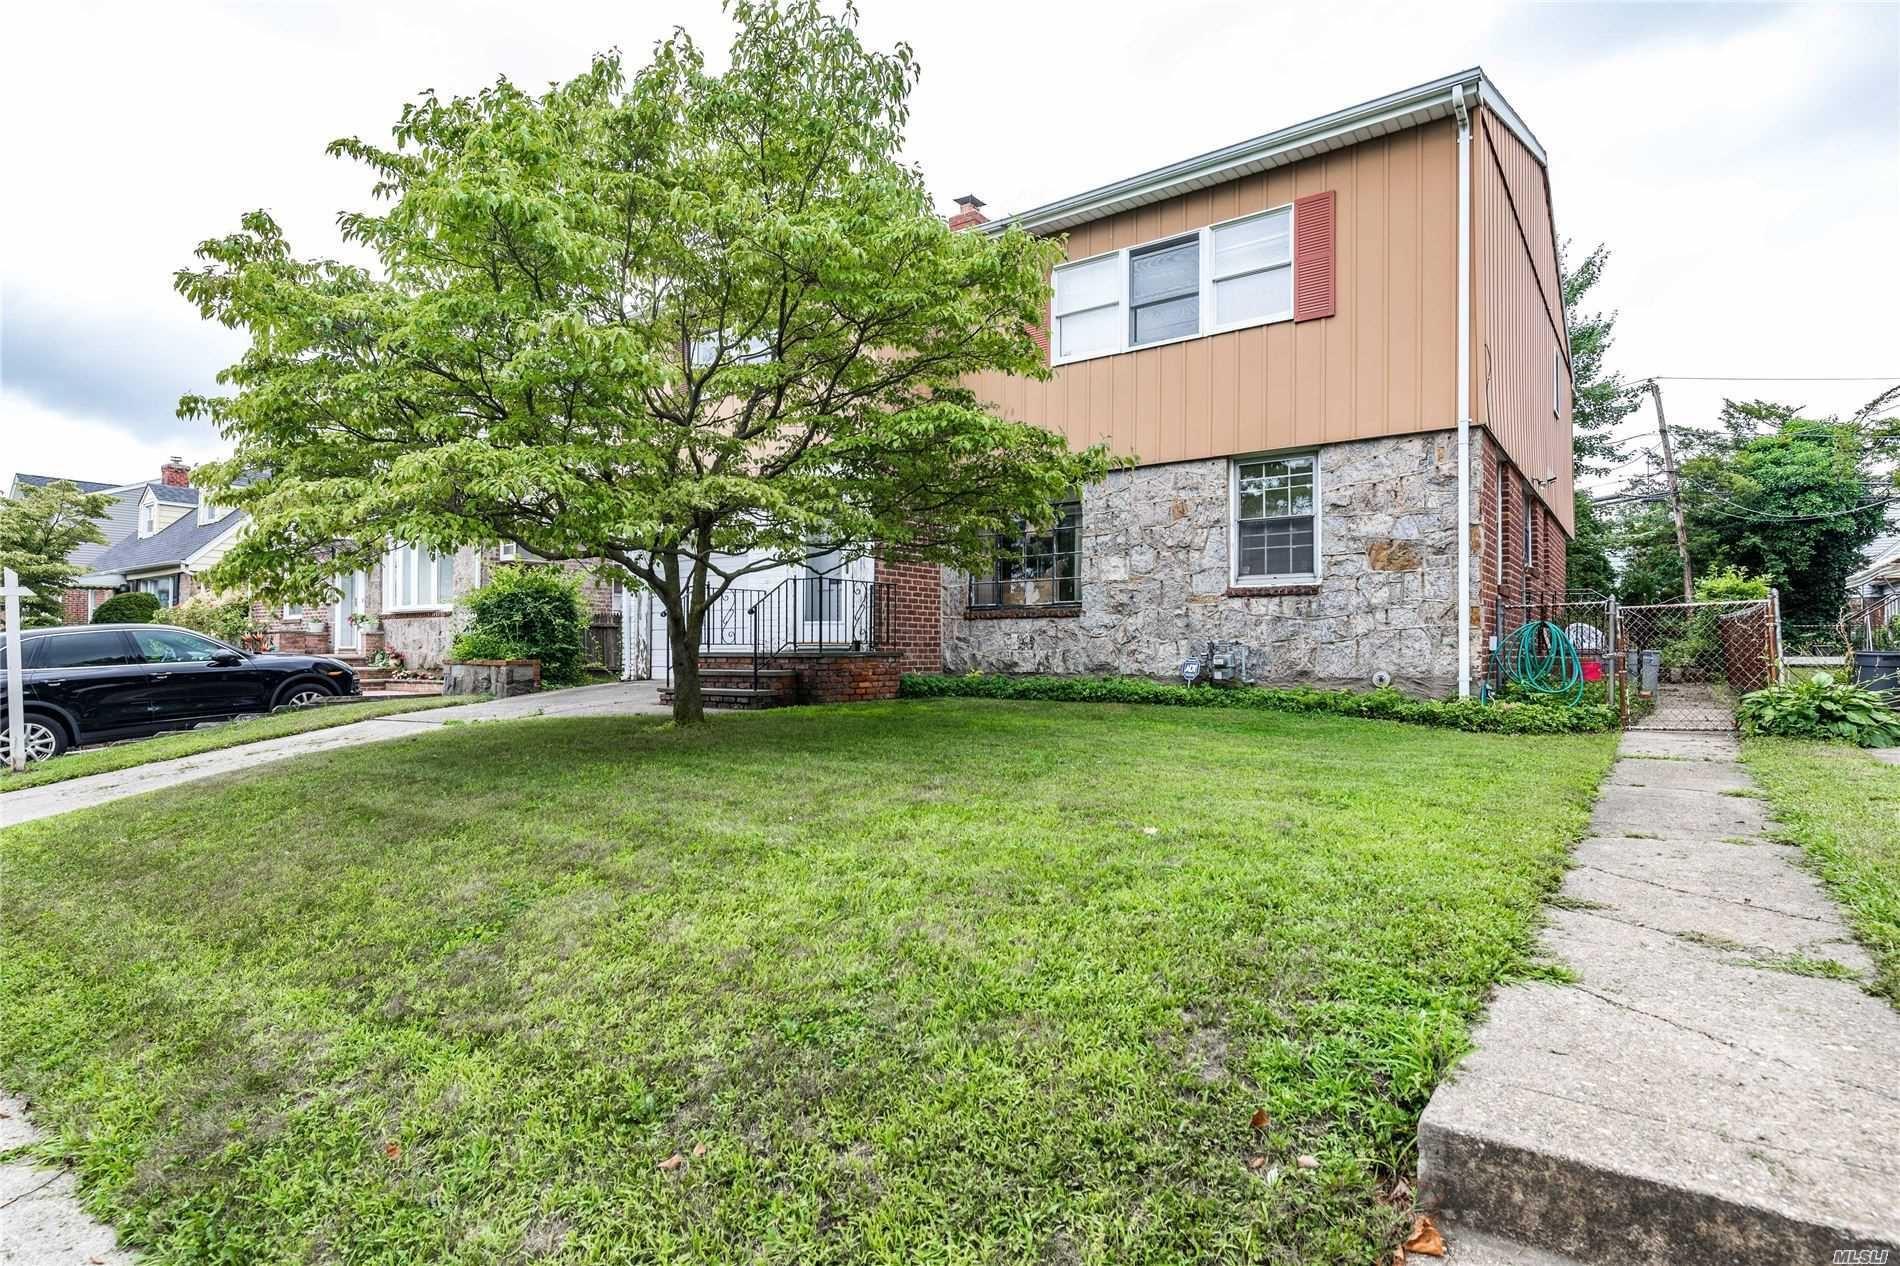 178 Devonshire Dr, New Hyde Park, NY 11040 - MLS#: 3238732